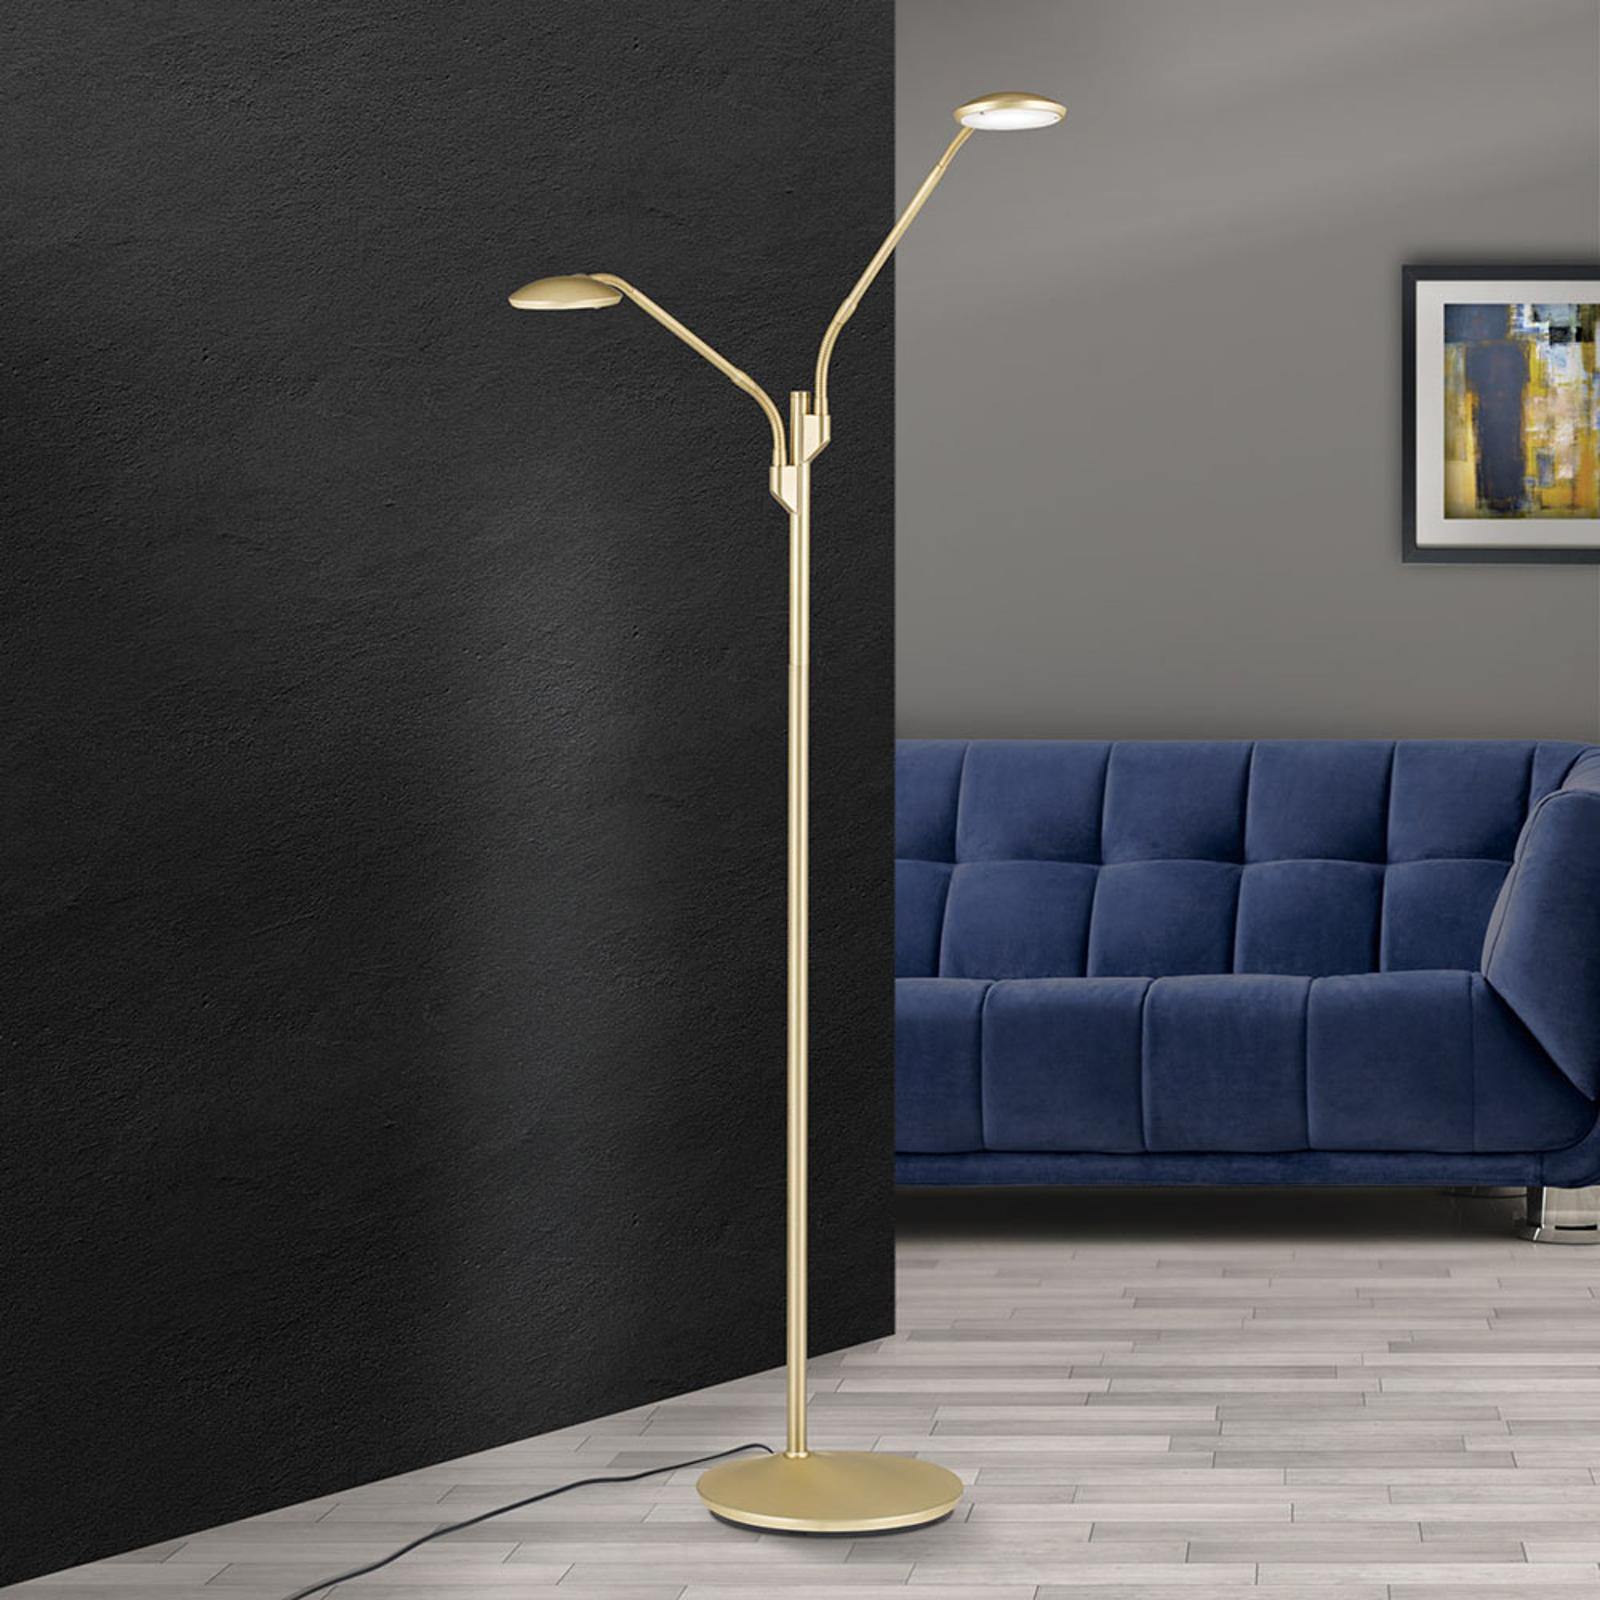 LED-gulvlampe Cobra, 2 lyskilder, messing-matt